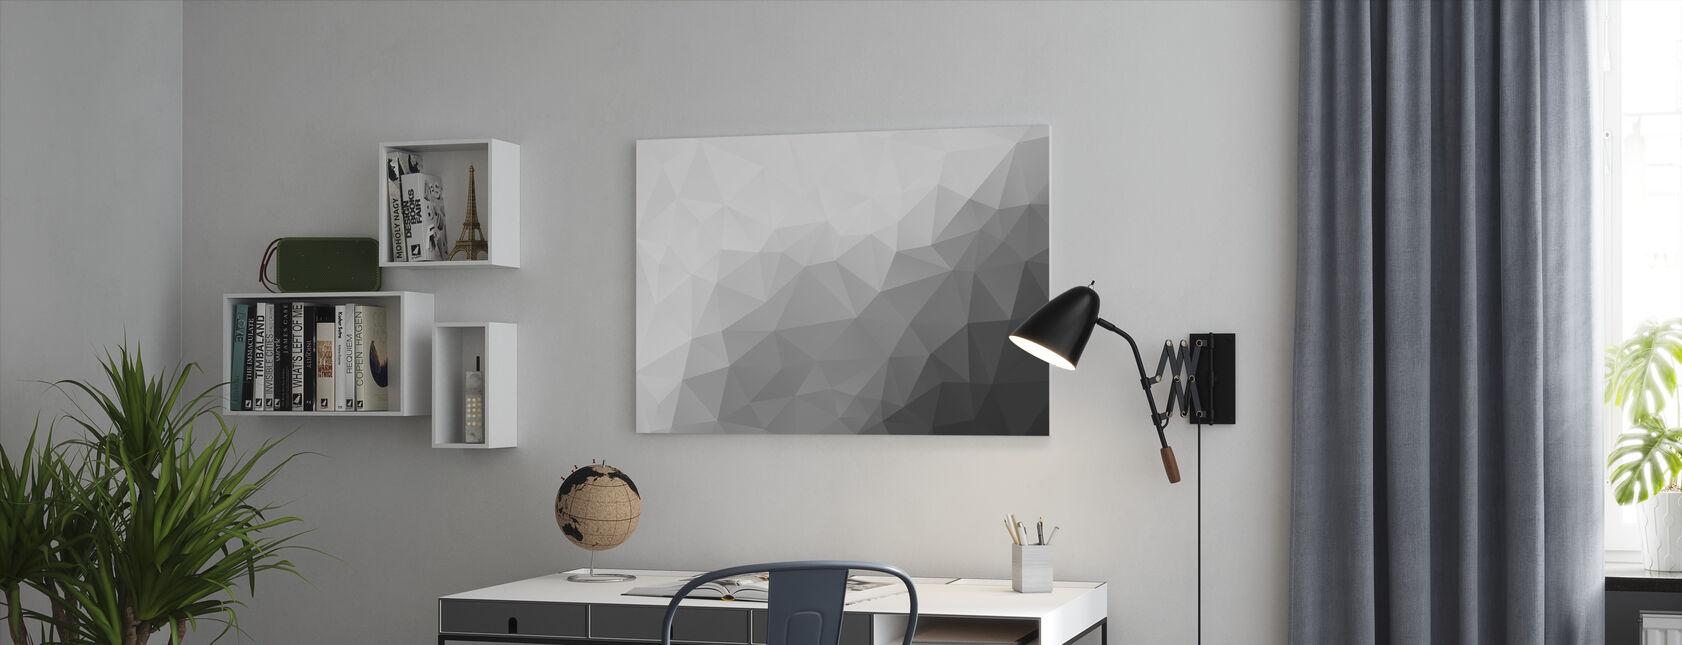 Polygonal Grey Shades 2 - Canvas print - Office